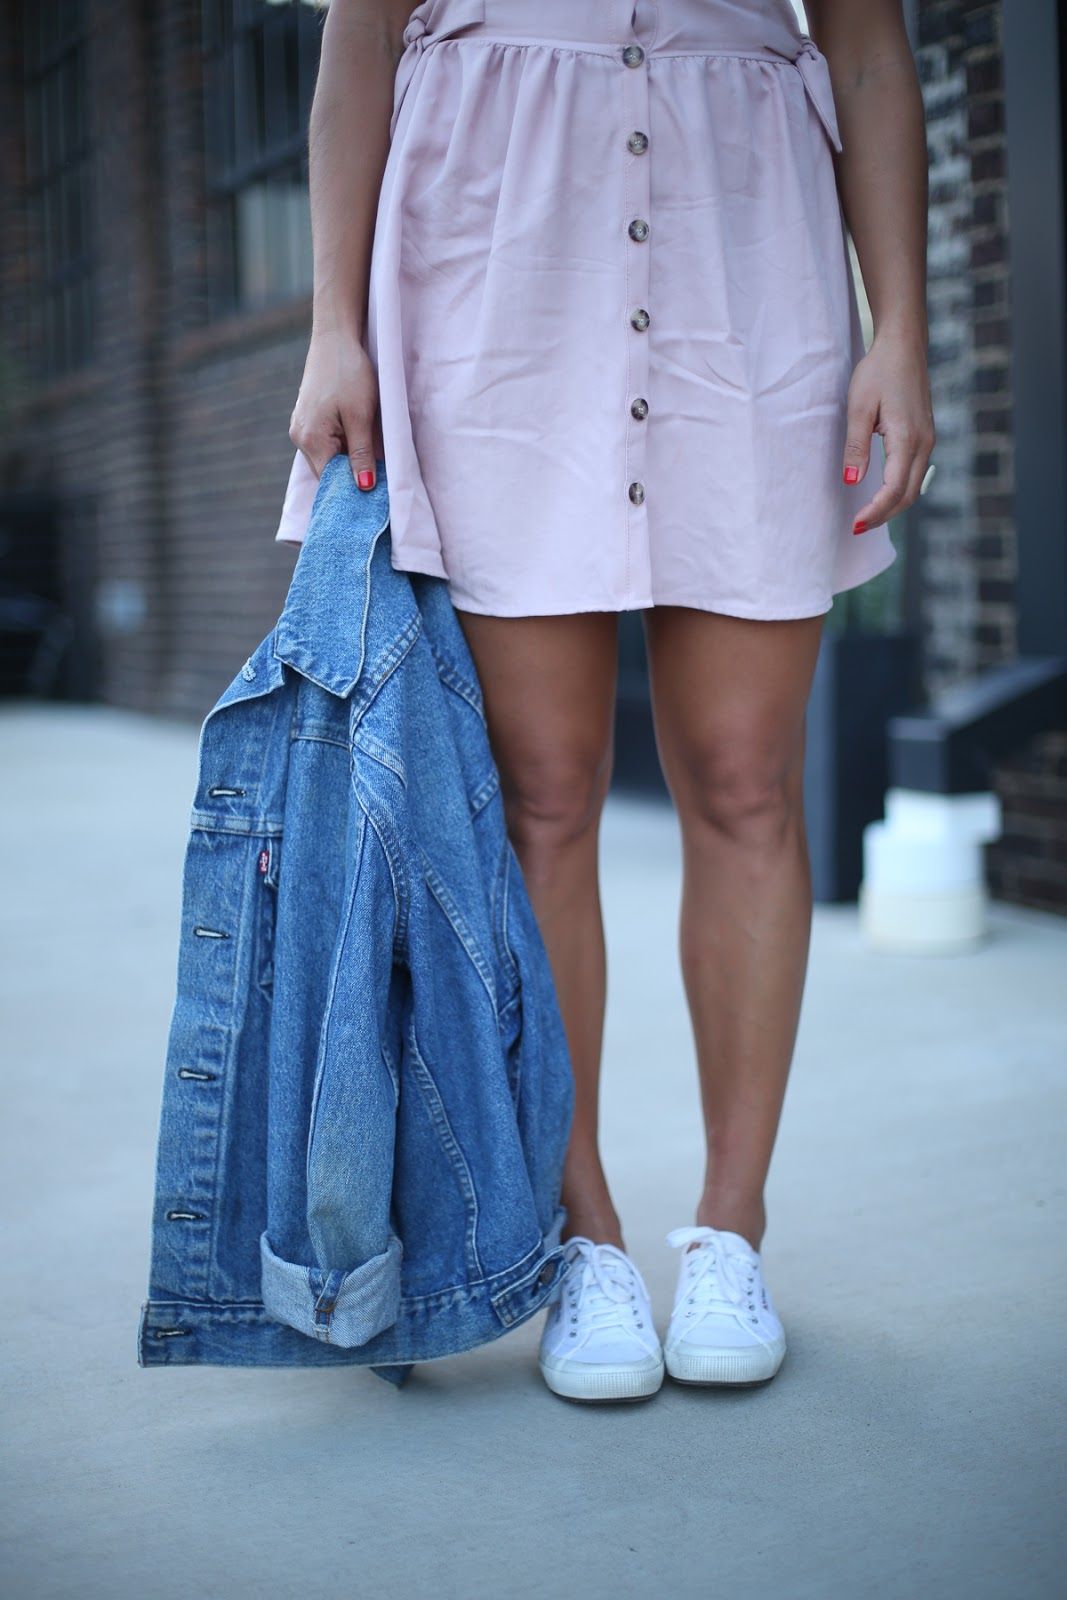 Priya the Blog, Nashville fashion blog, Nashville fashion blogger, Nashville style blog, Nashville style blogger, Superga trainers, white tennis shoes, blush linen Zara dress, oversized vintage jean jacket, vintage jean jacket, vintage jean jacket for Summer,